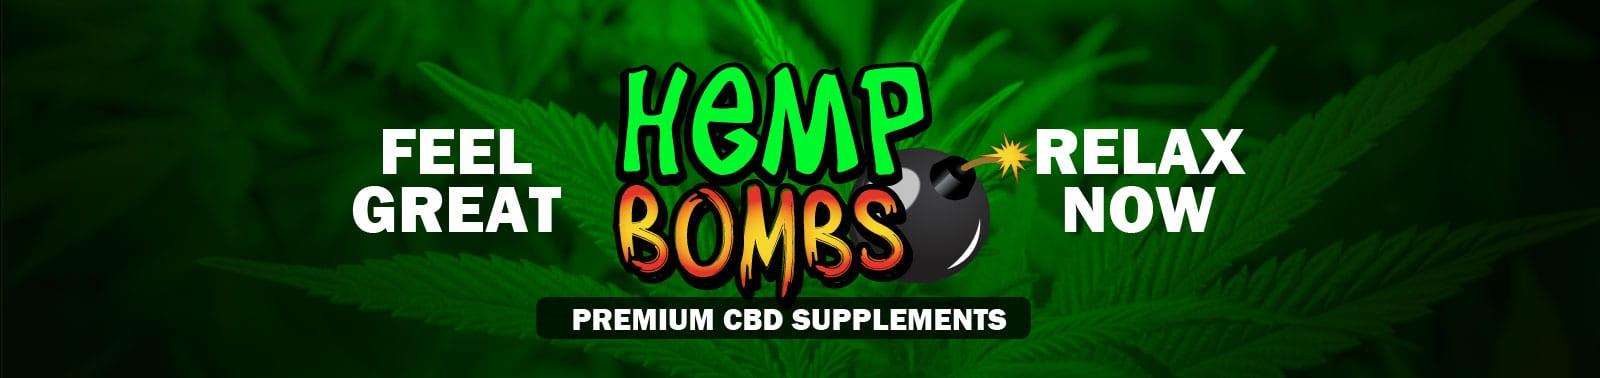 Hemp Bombs - Premium CBD Supplements including gummies, capsules, oil, vape, syrup and pain rub